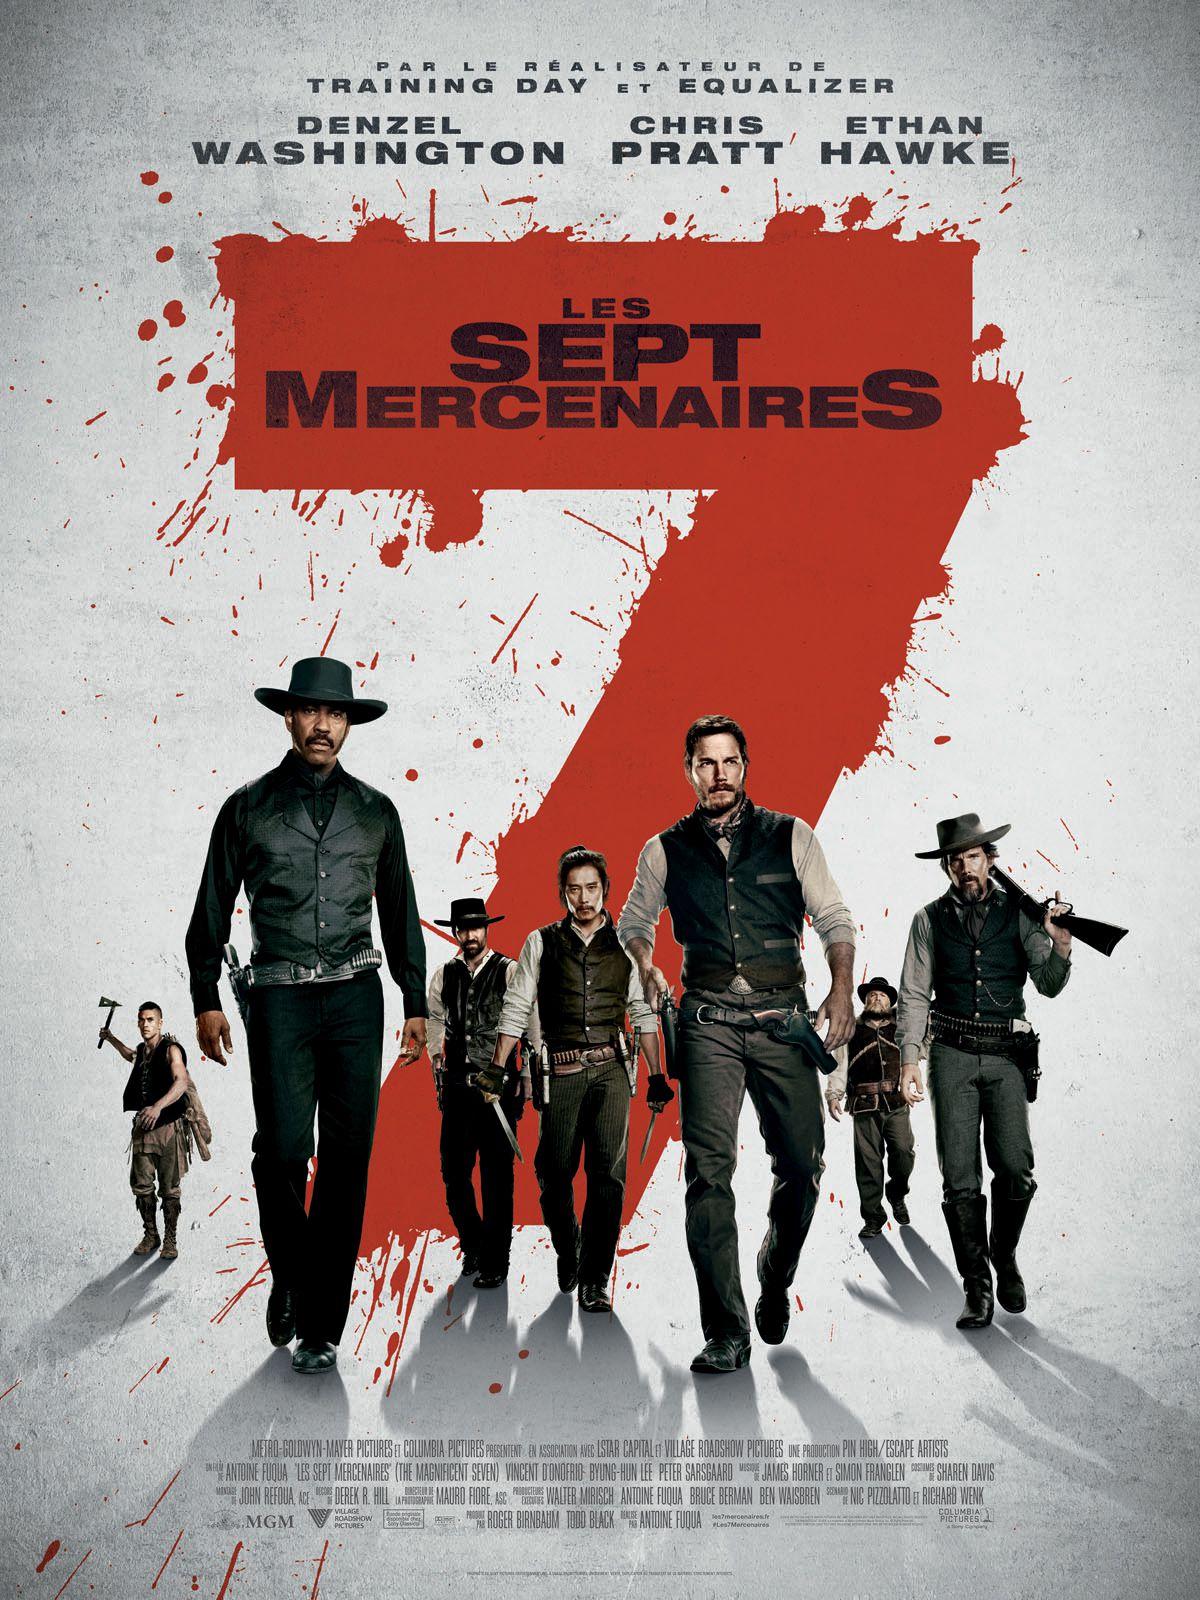 Les Sept Mercenaires - Film (2016)